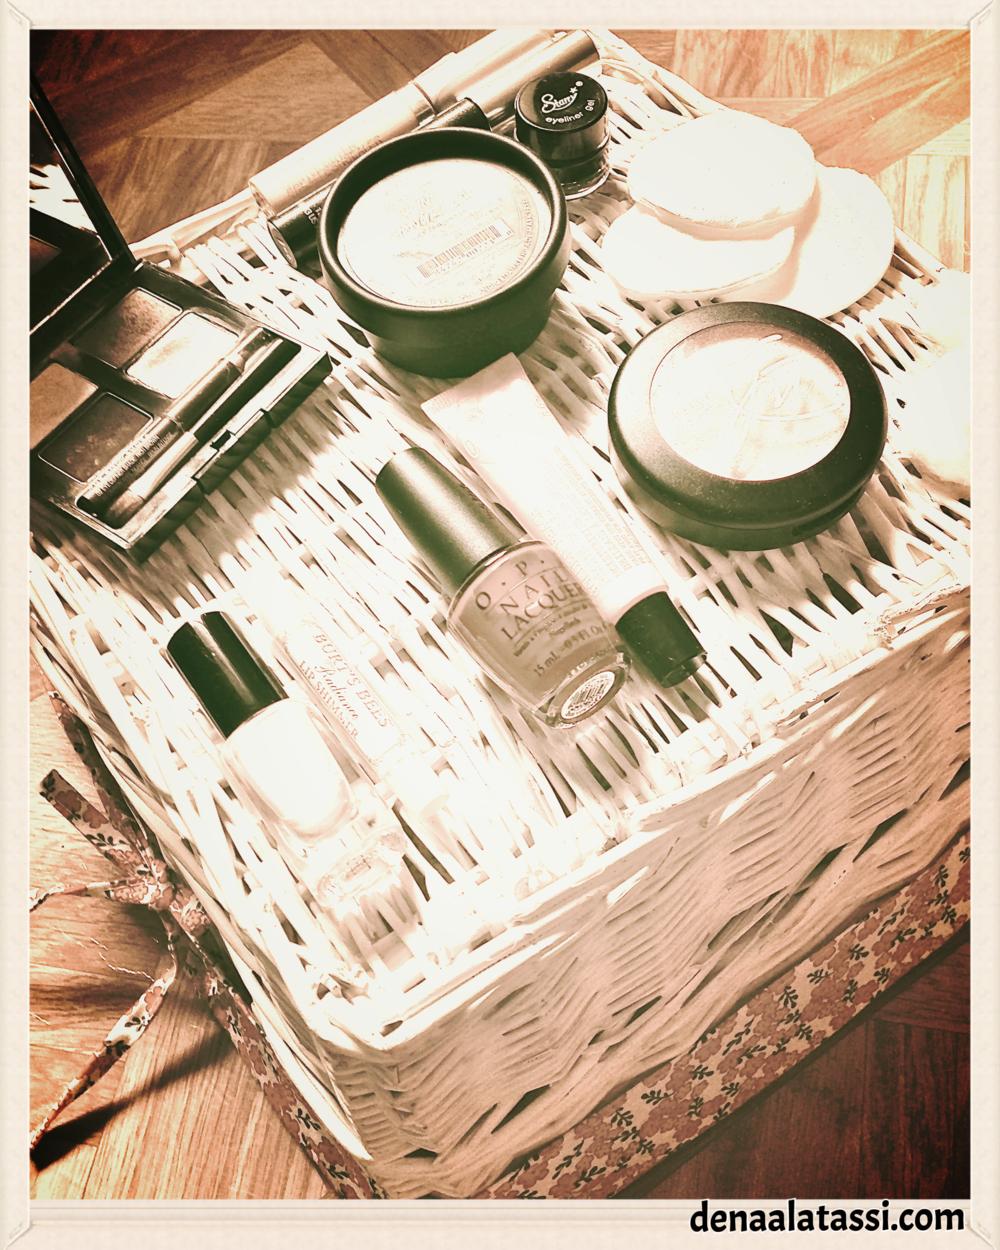 Summer Makeup Kit in Nashville, TN ~ July 2013